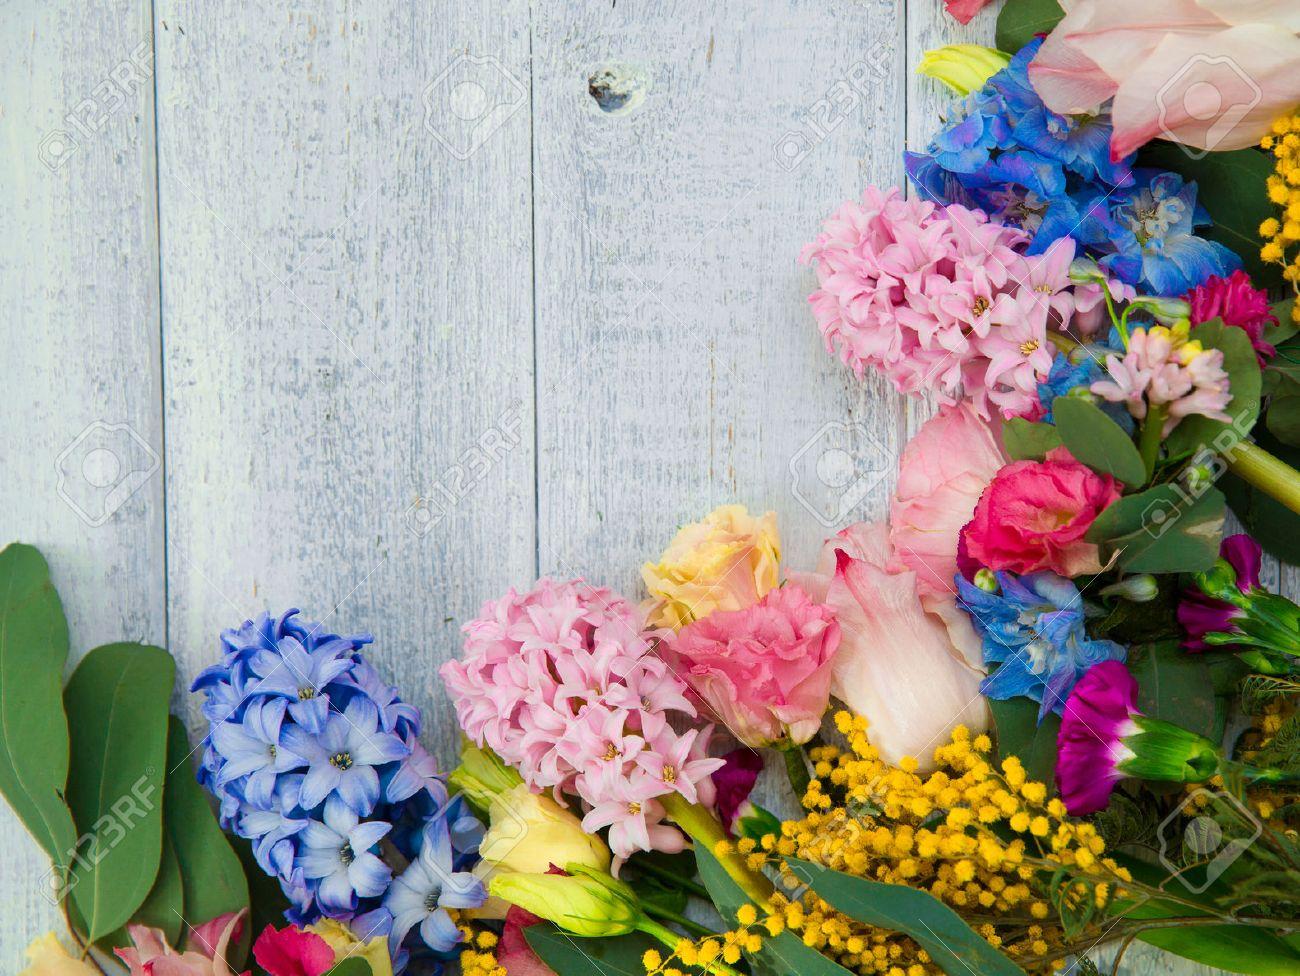 Spring flowers on wood background summer blooming border on stock spring flowers on wood background summer blooming border on a wooden table stock photo mightylinksfo Gallery